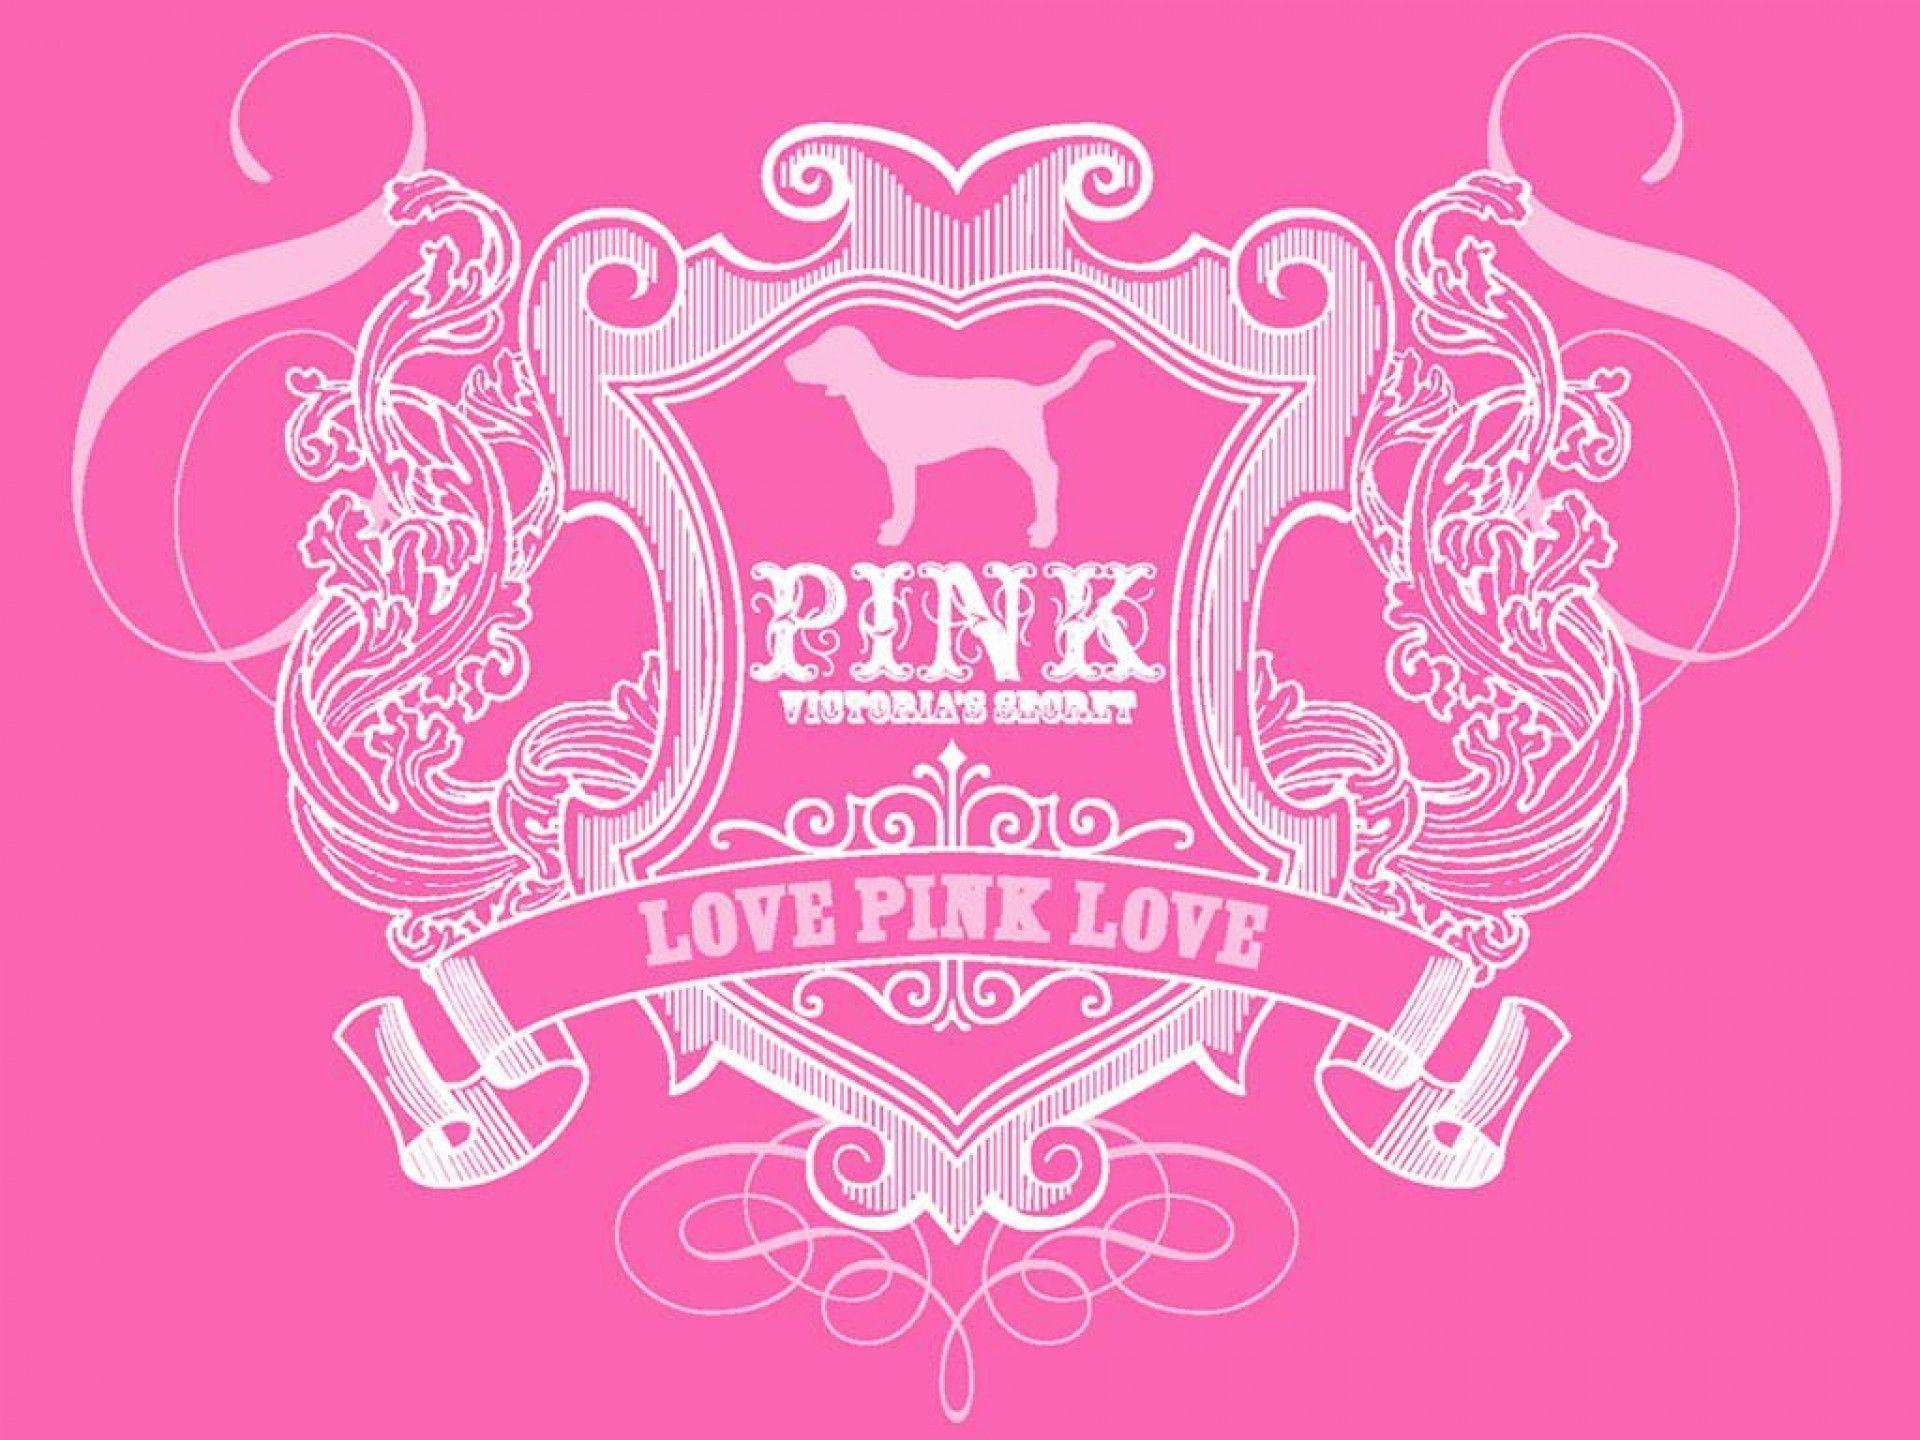 Cool Wallpaper Love Pink - pwBoWD8  Graphic_74657.jpg